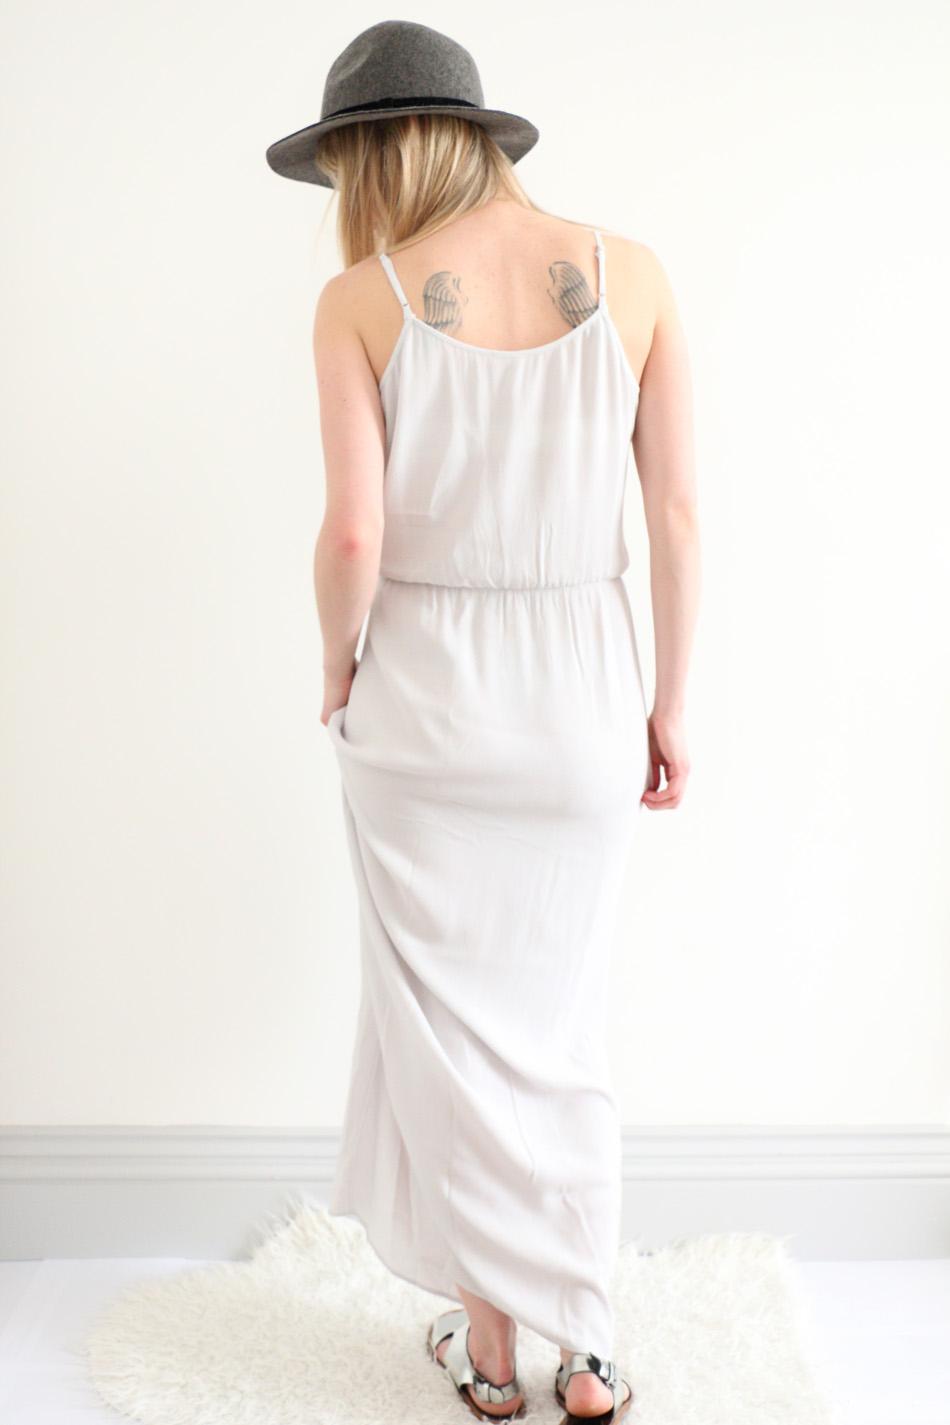 FD American Vintage dress IMG_1051 950px